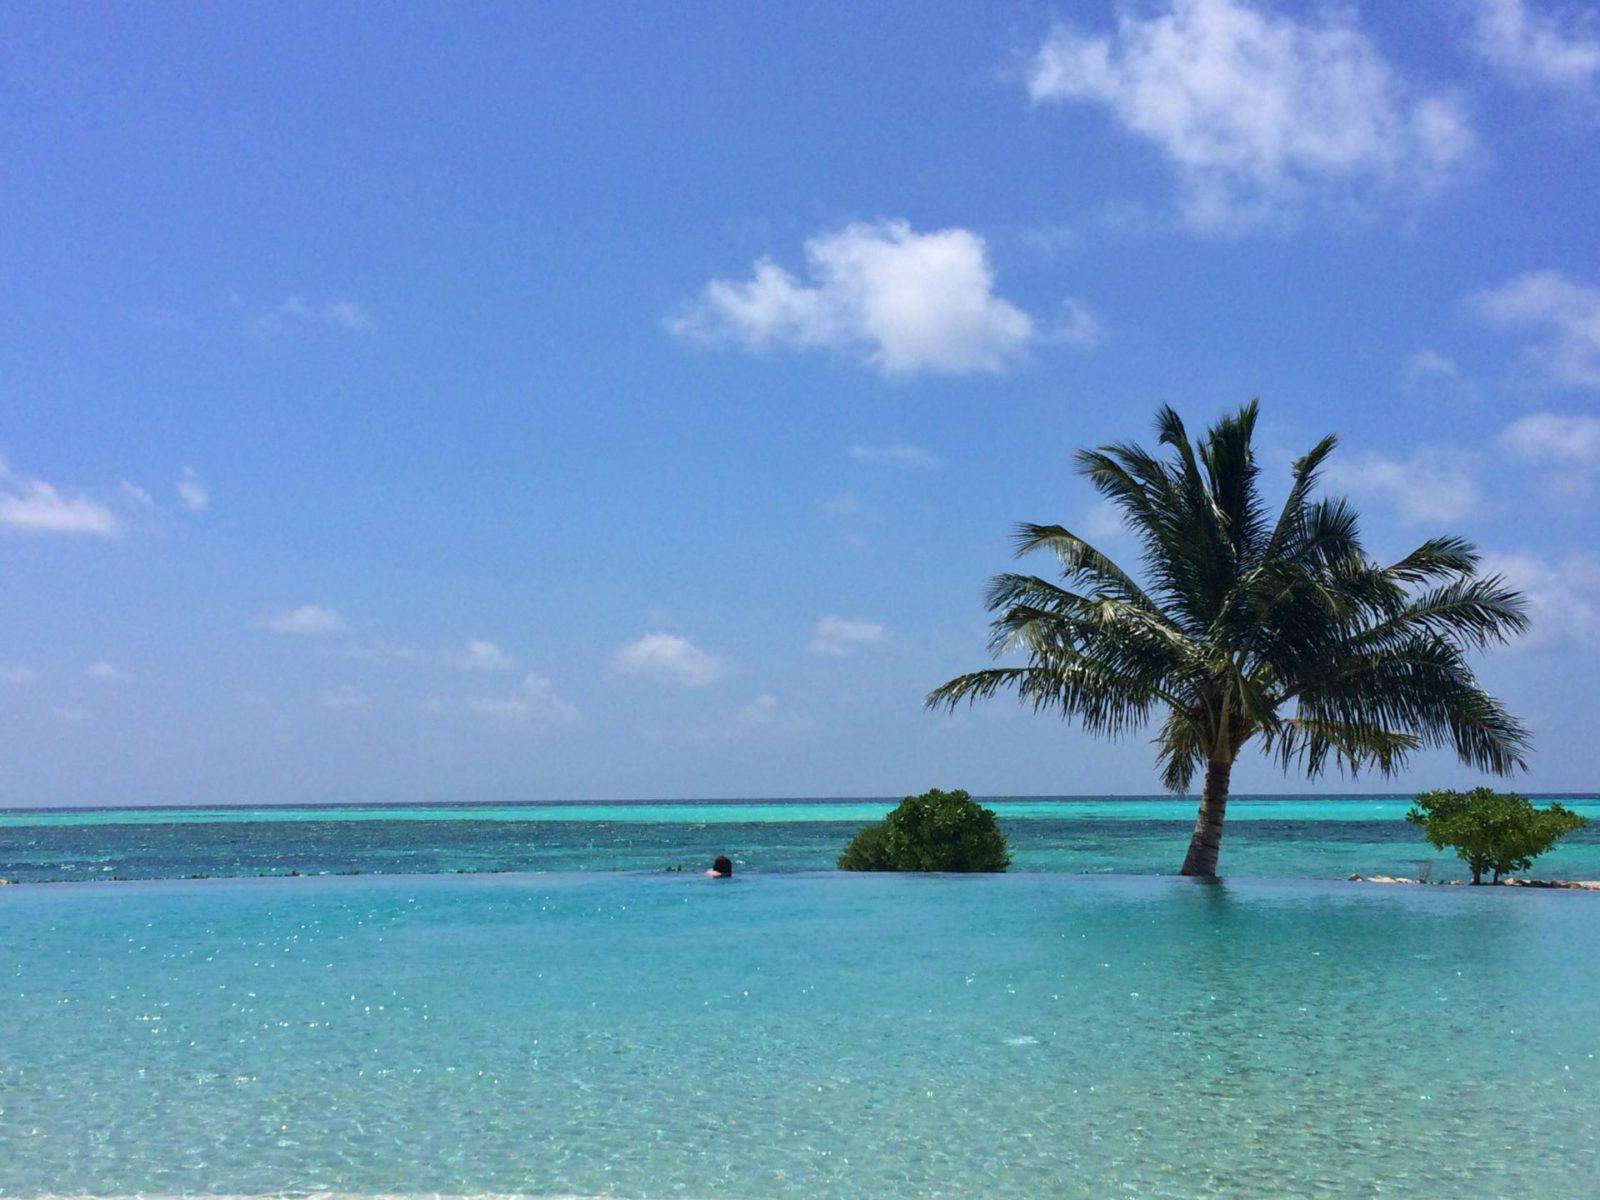 infinity pool luxury travel lux resort the maldives